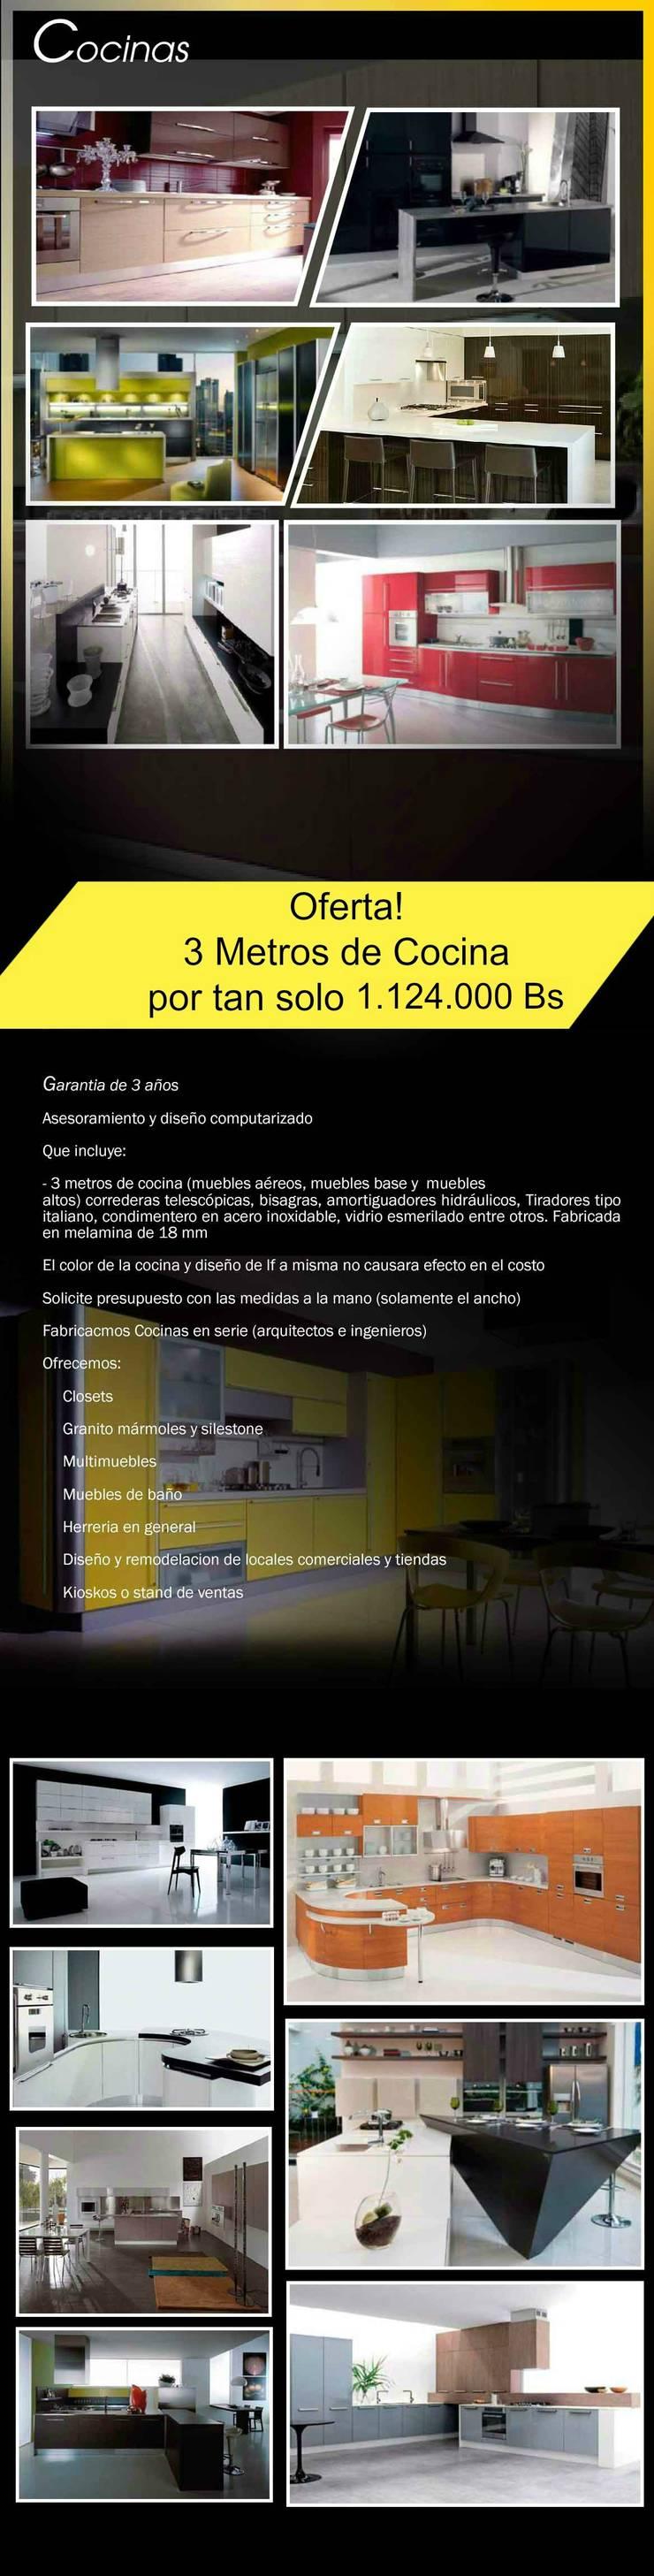 Empotrado de cocina: muebles aereos, base, torres de horno, torres nevera, etc...: Cocina de estilo  por Filippo Cucine C.A.